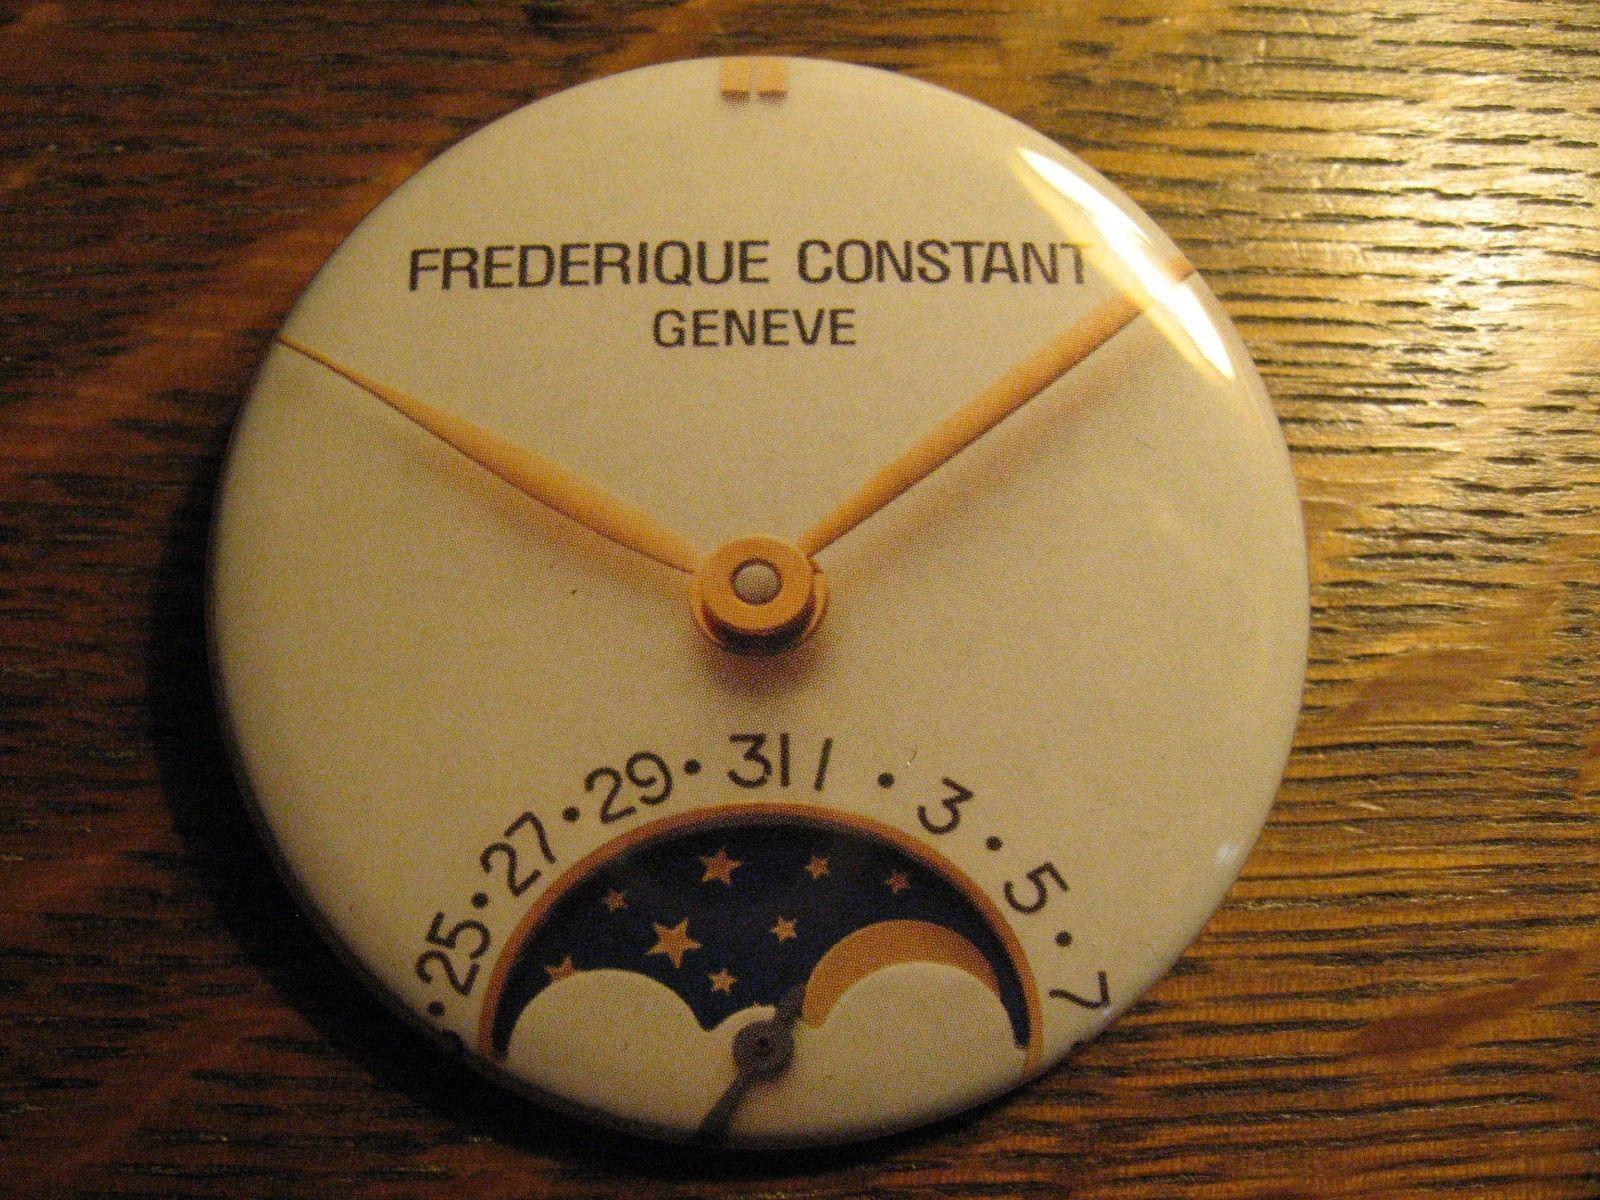 Frederique Constant Moon Dial Swiss Wrist Watch Advertisement Button Lapel Pin